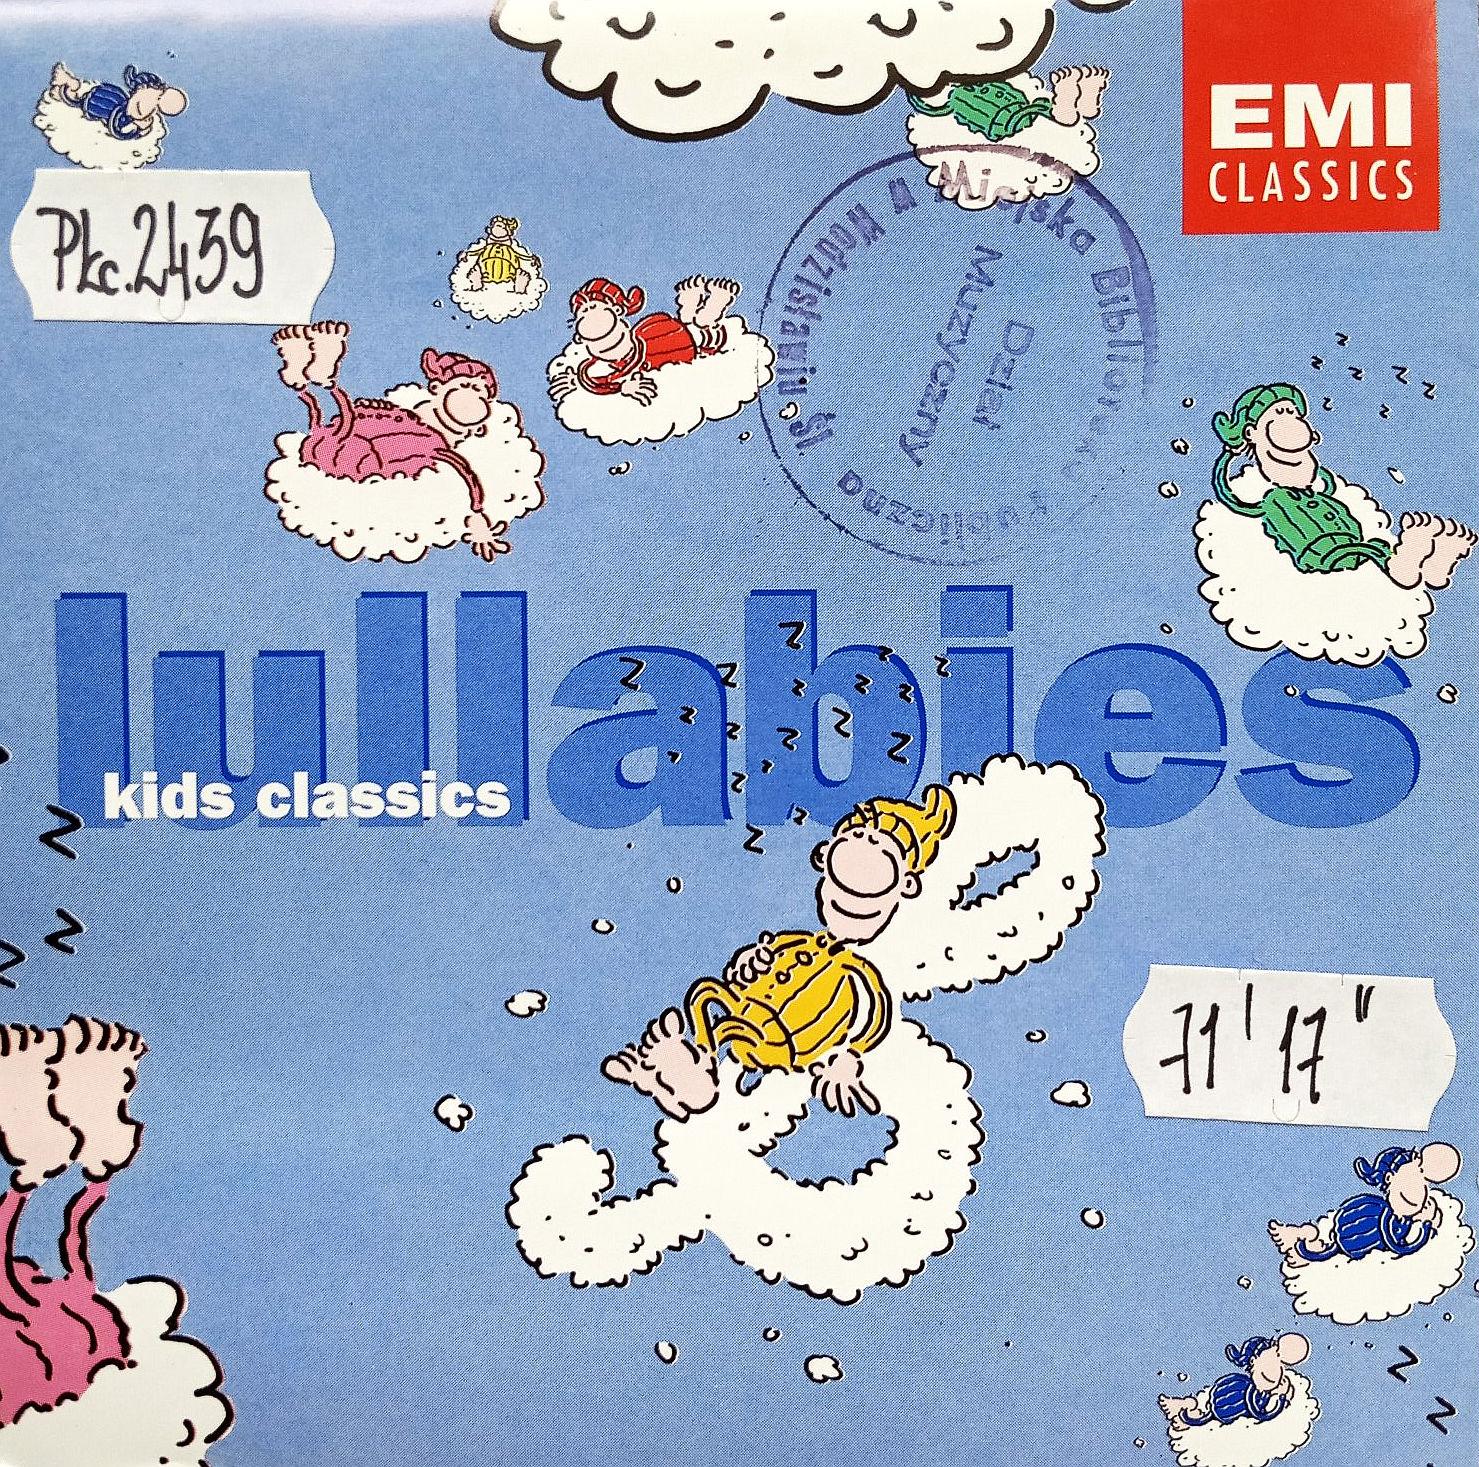 Kids Classics – Lullabies